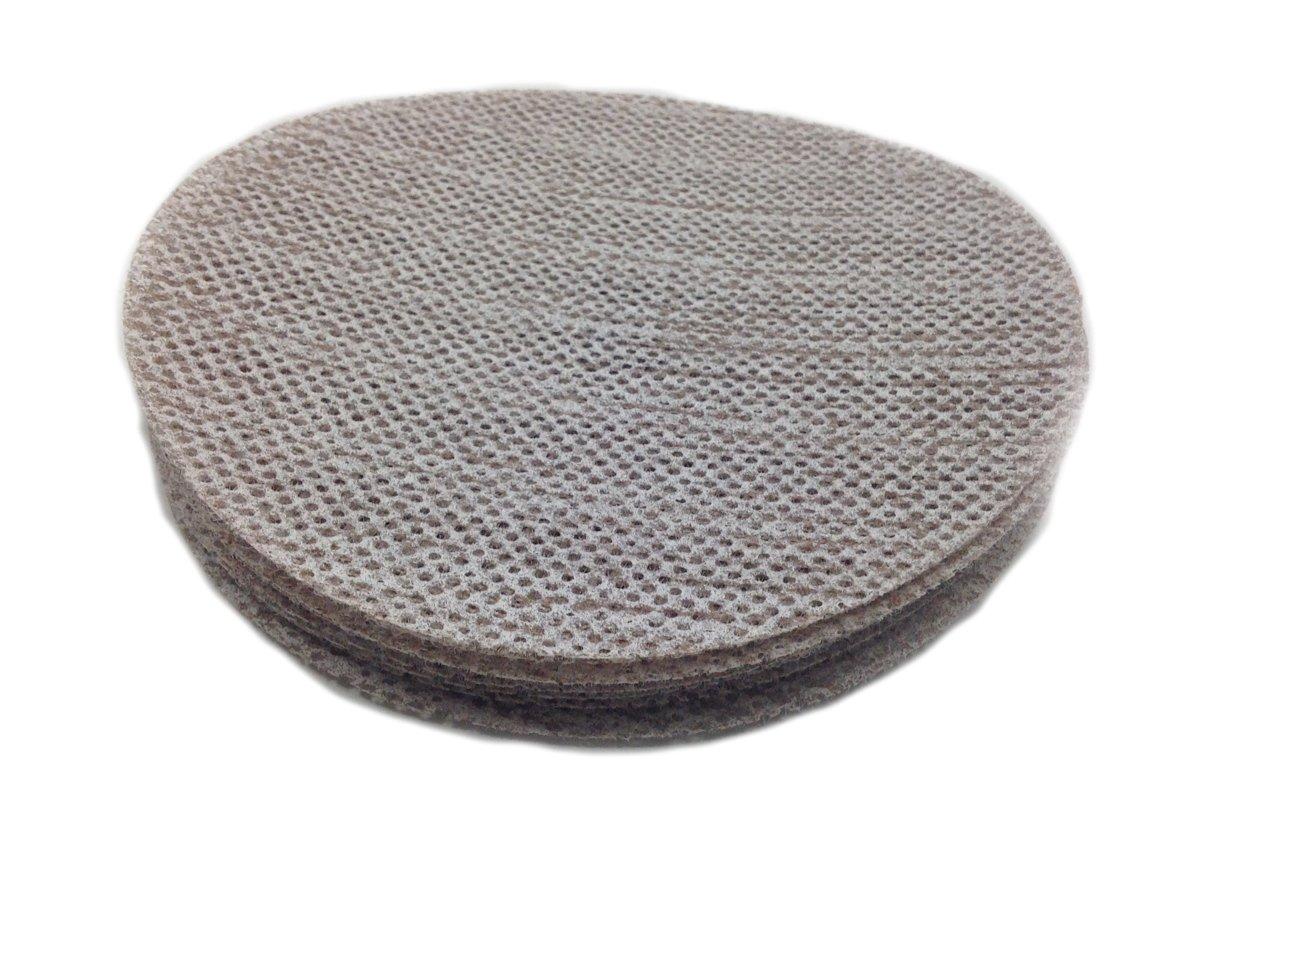 Sungold Abrasives 91-875-060 Trinet Mesh 60 Grit Hook & Loop Stearated Aluminum Oxide Sanding Discs for Drywall Sanders, 10 Pack, 9''